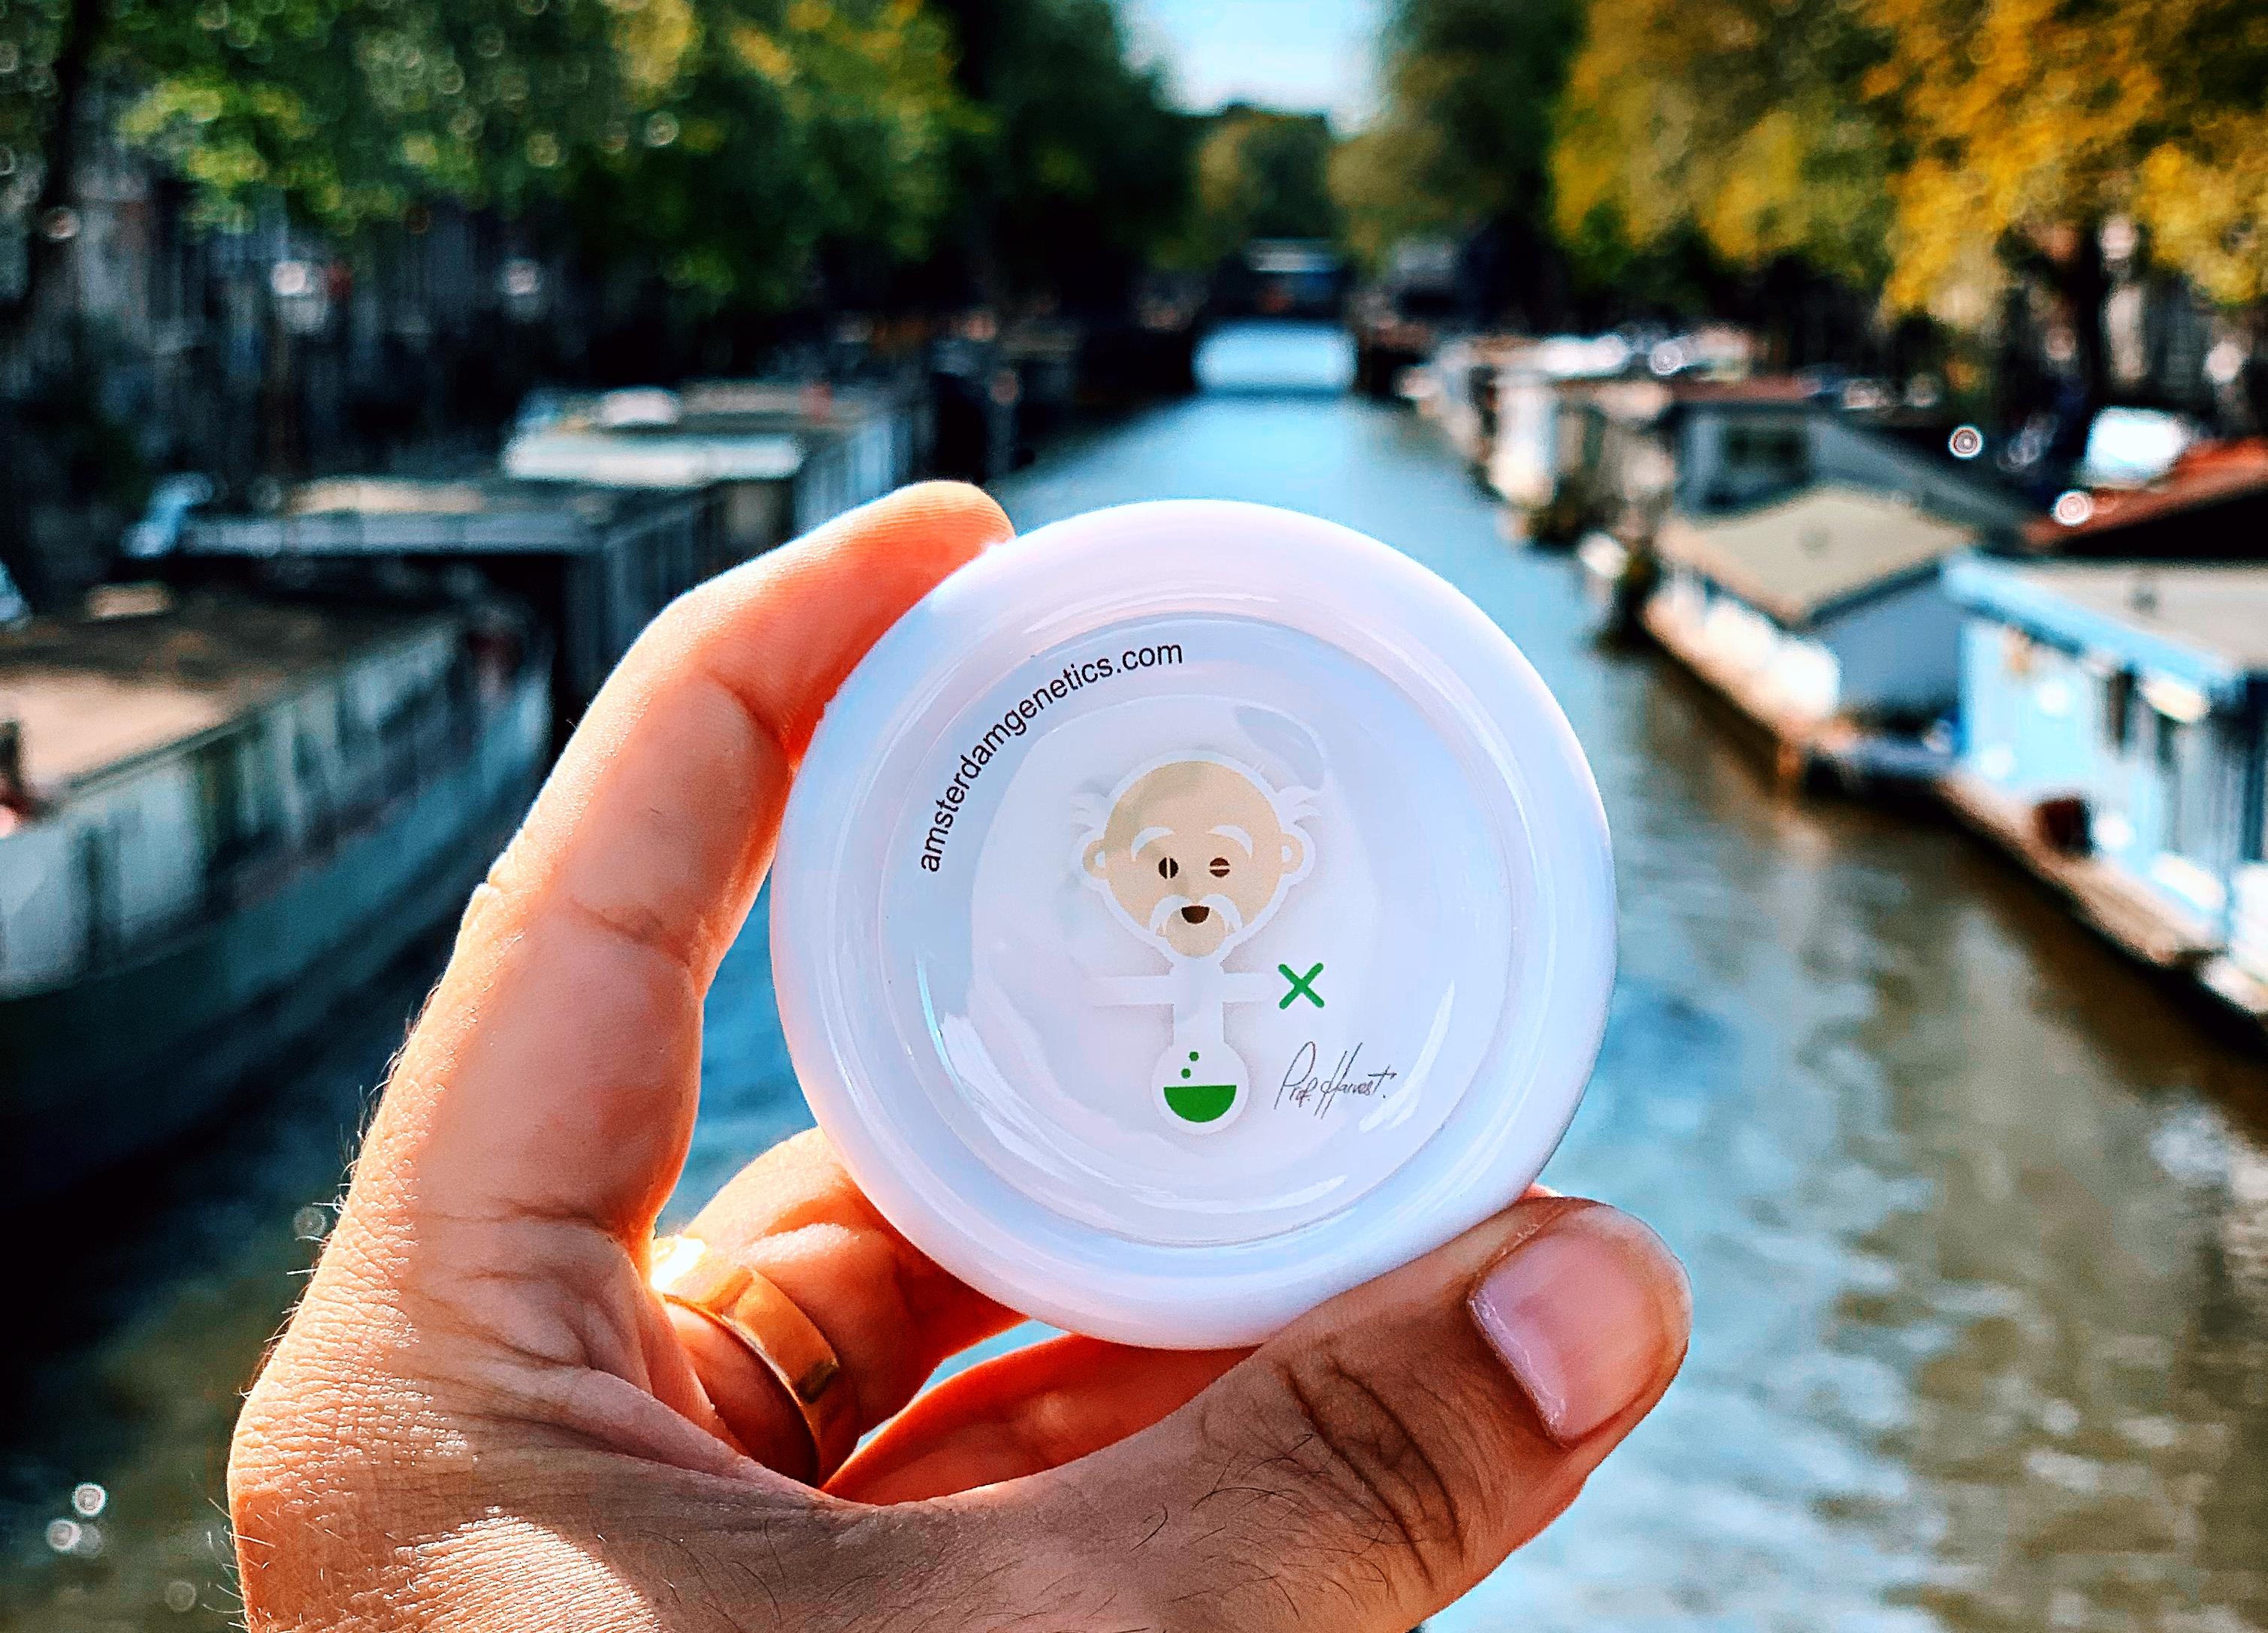 grinder Amsterdam Genetics